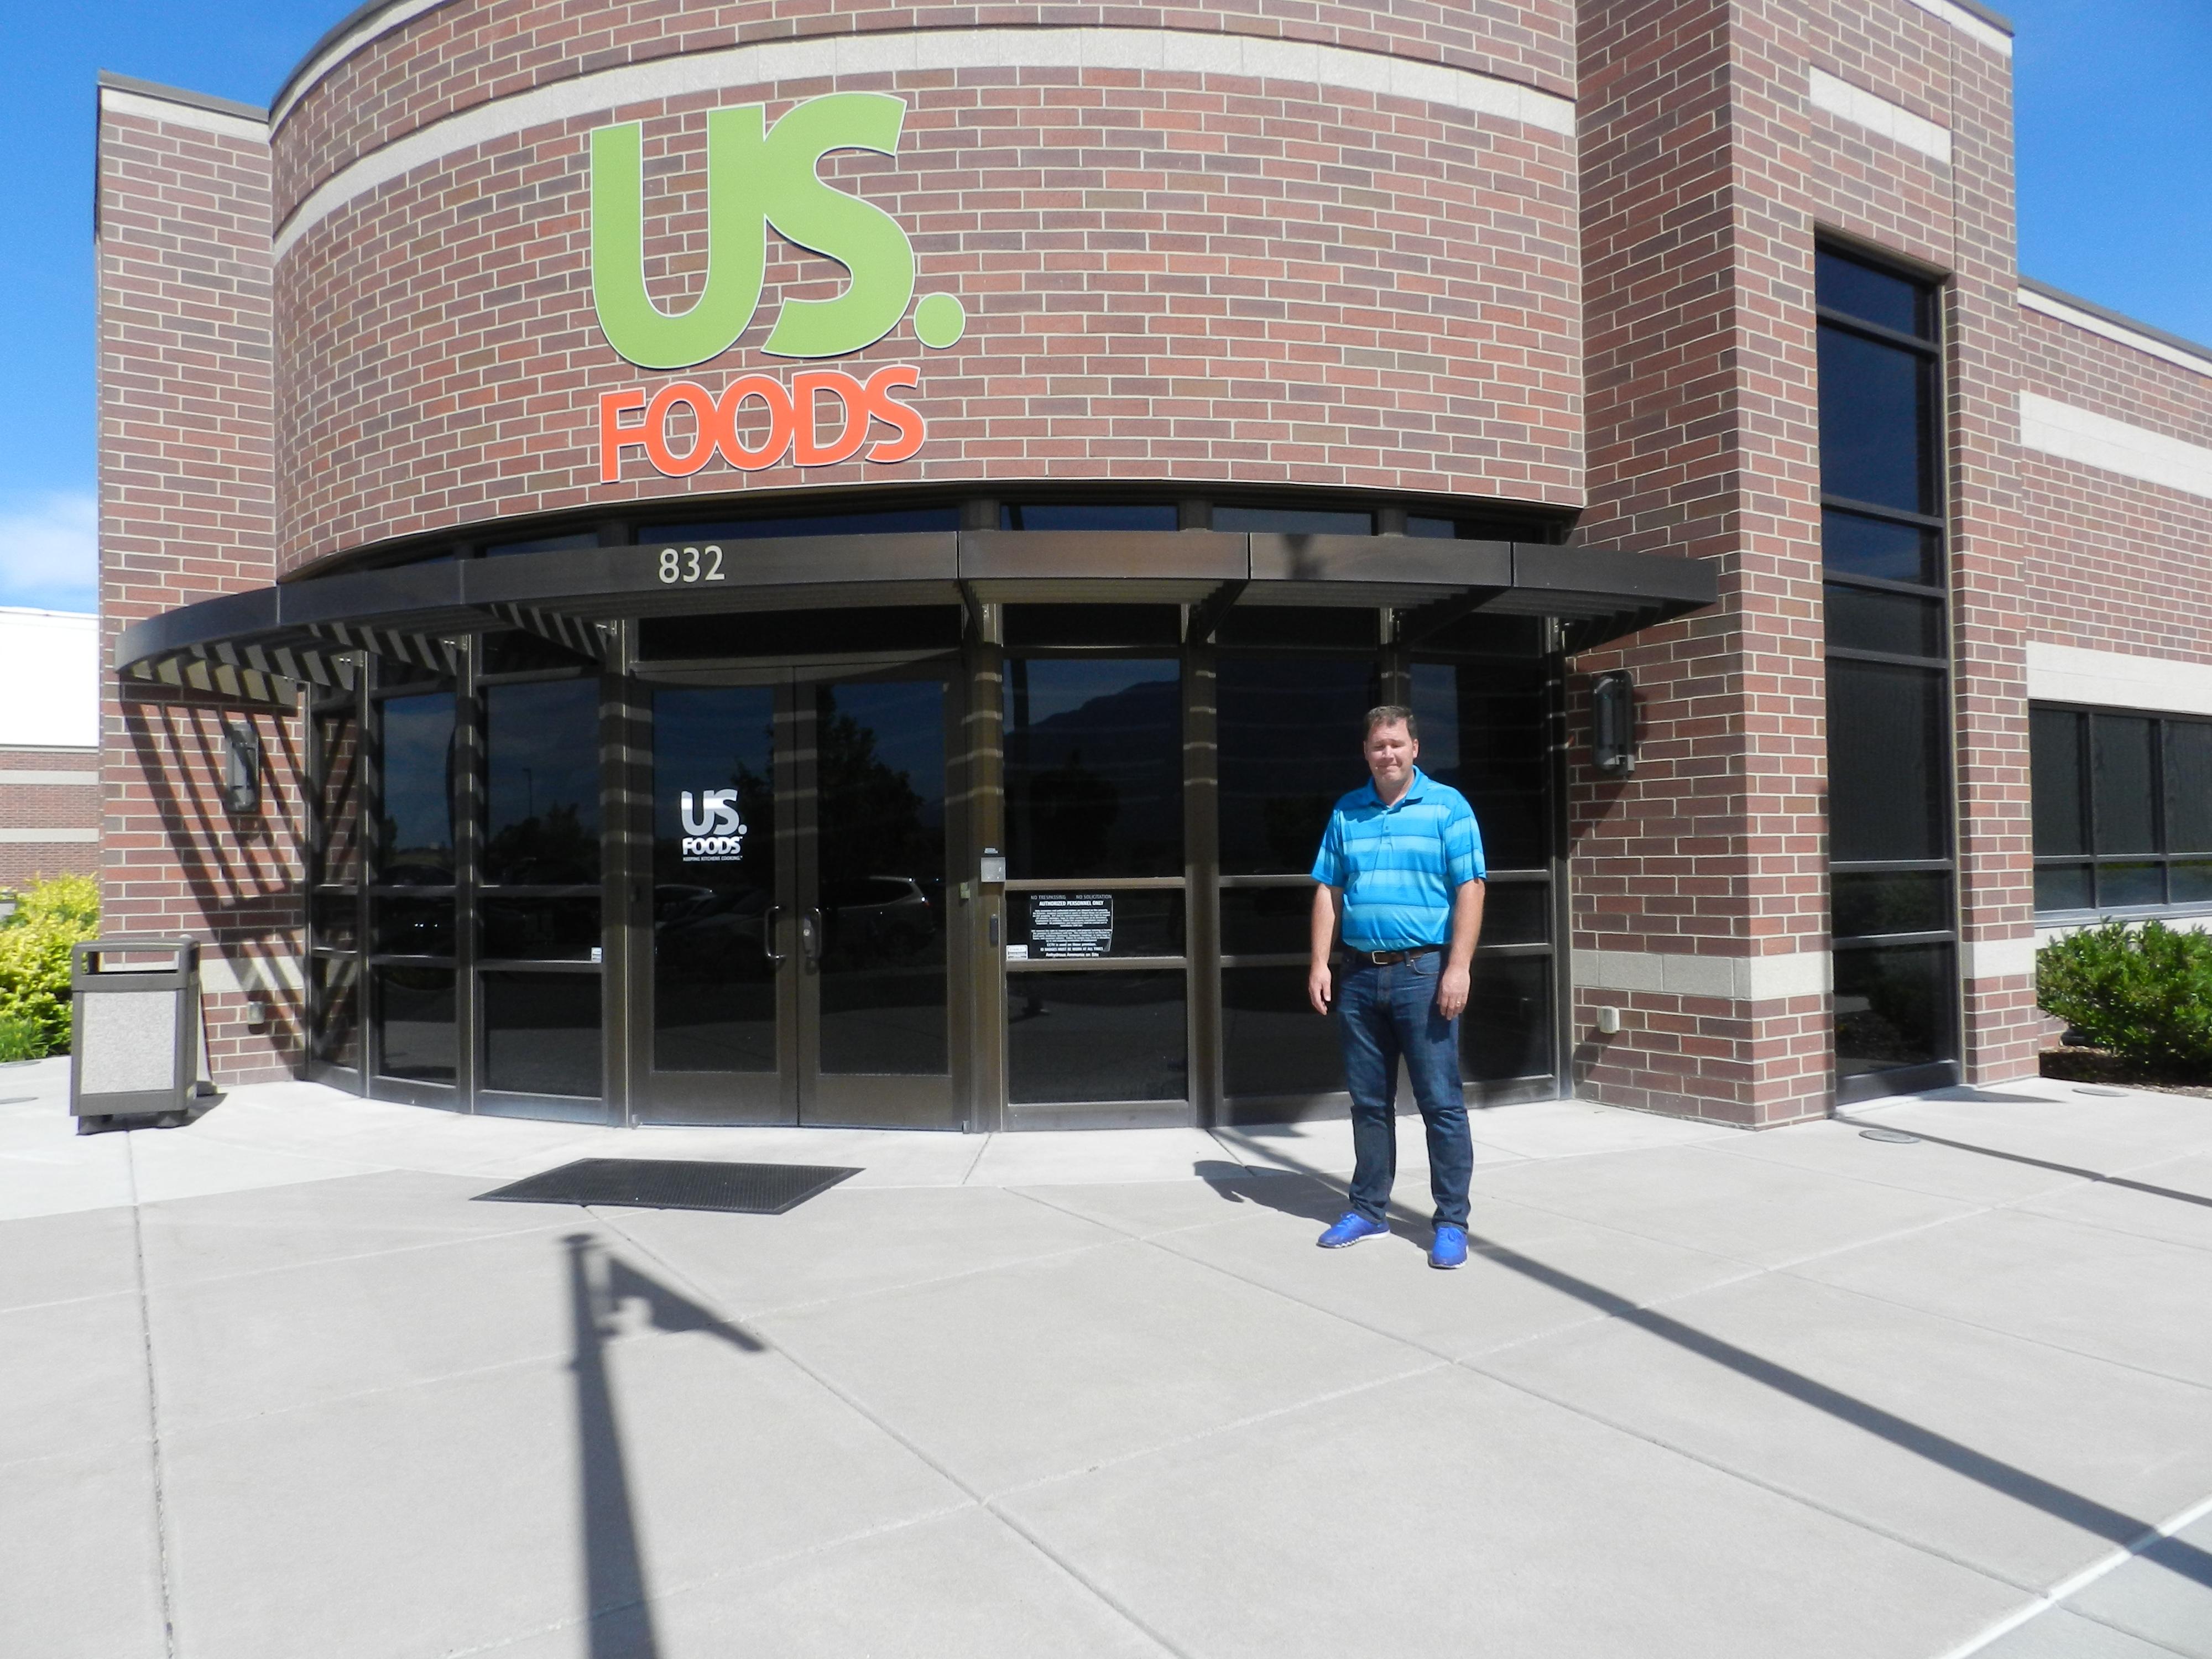 Nubiz › U S  Foods Focuses on Employee Retention to Grow